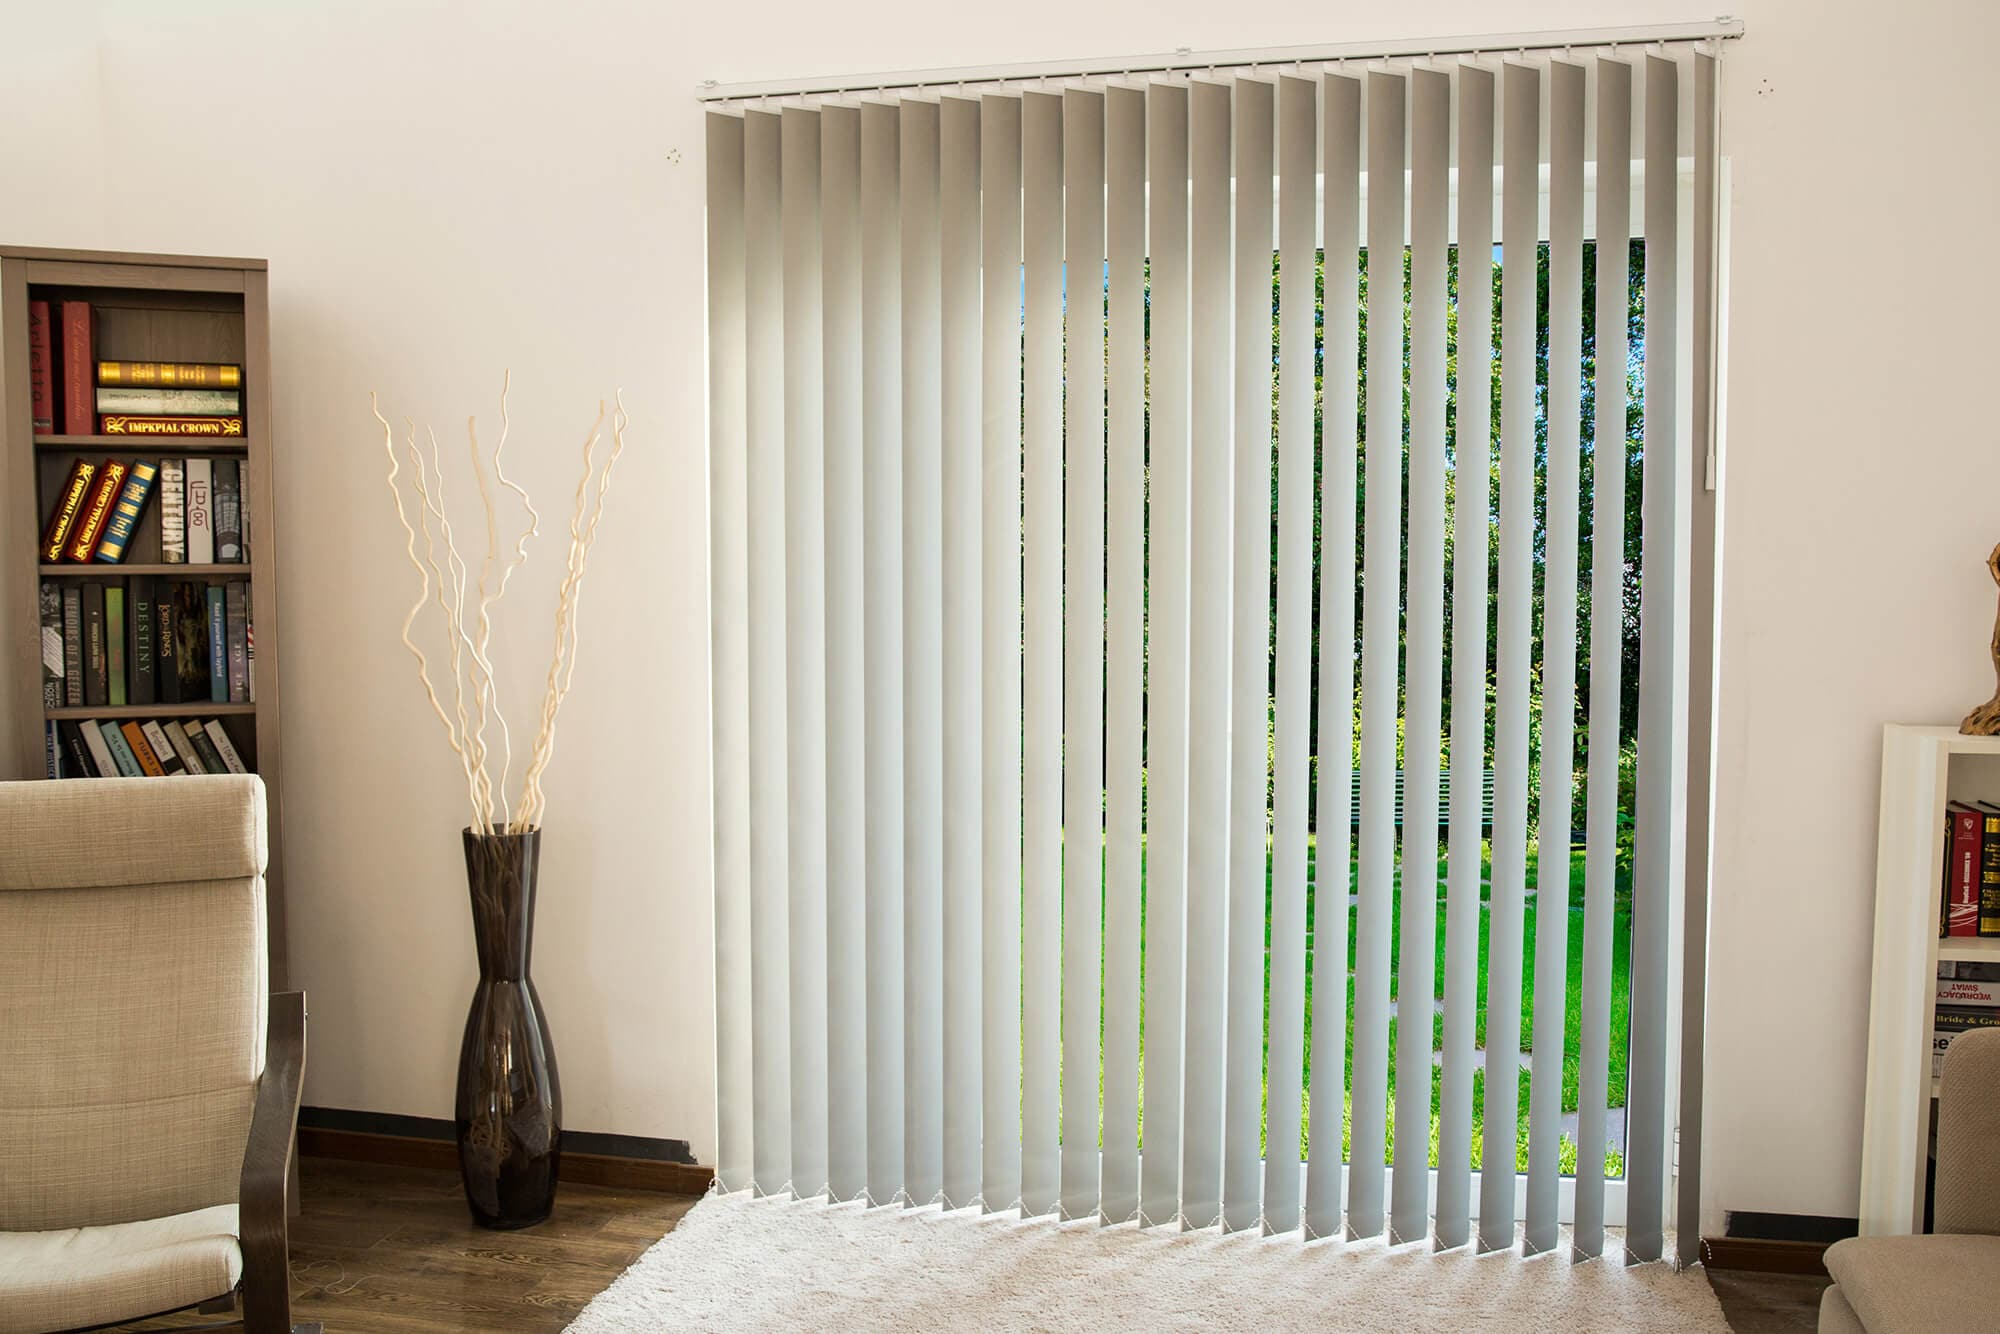 alugard plissee ersatzteile cosiflor wei with alugard plissee ersatzteile gallery of with. Black Bedroom Furniture Sets. Home Design Ideas